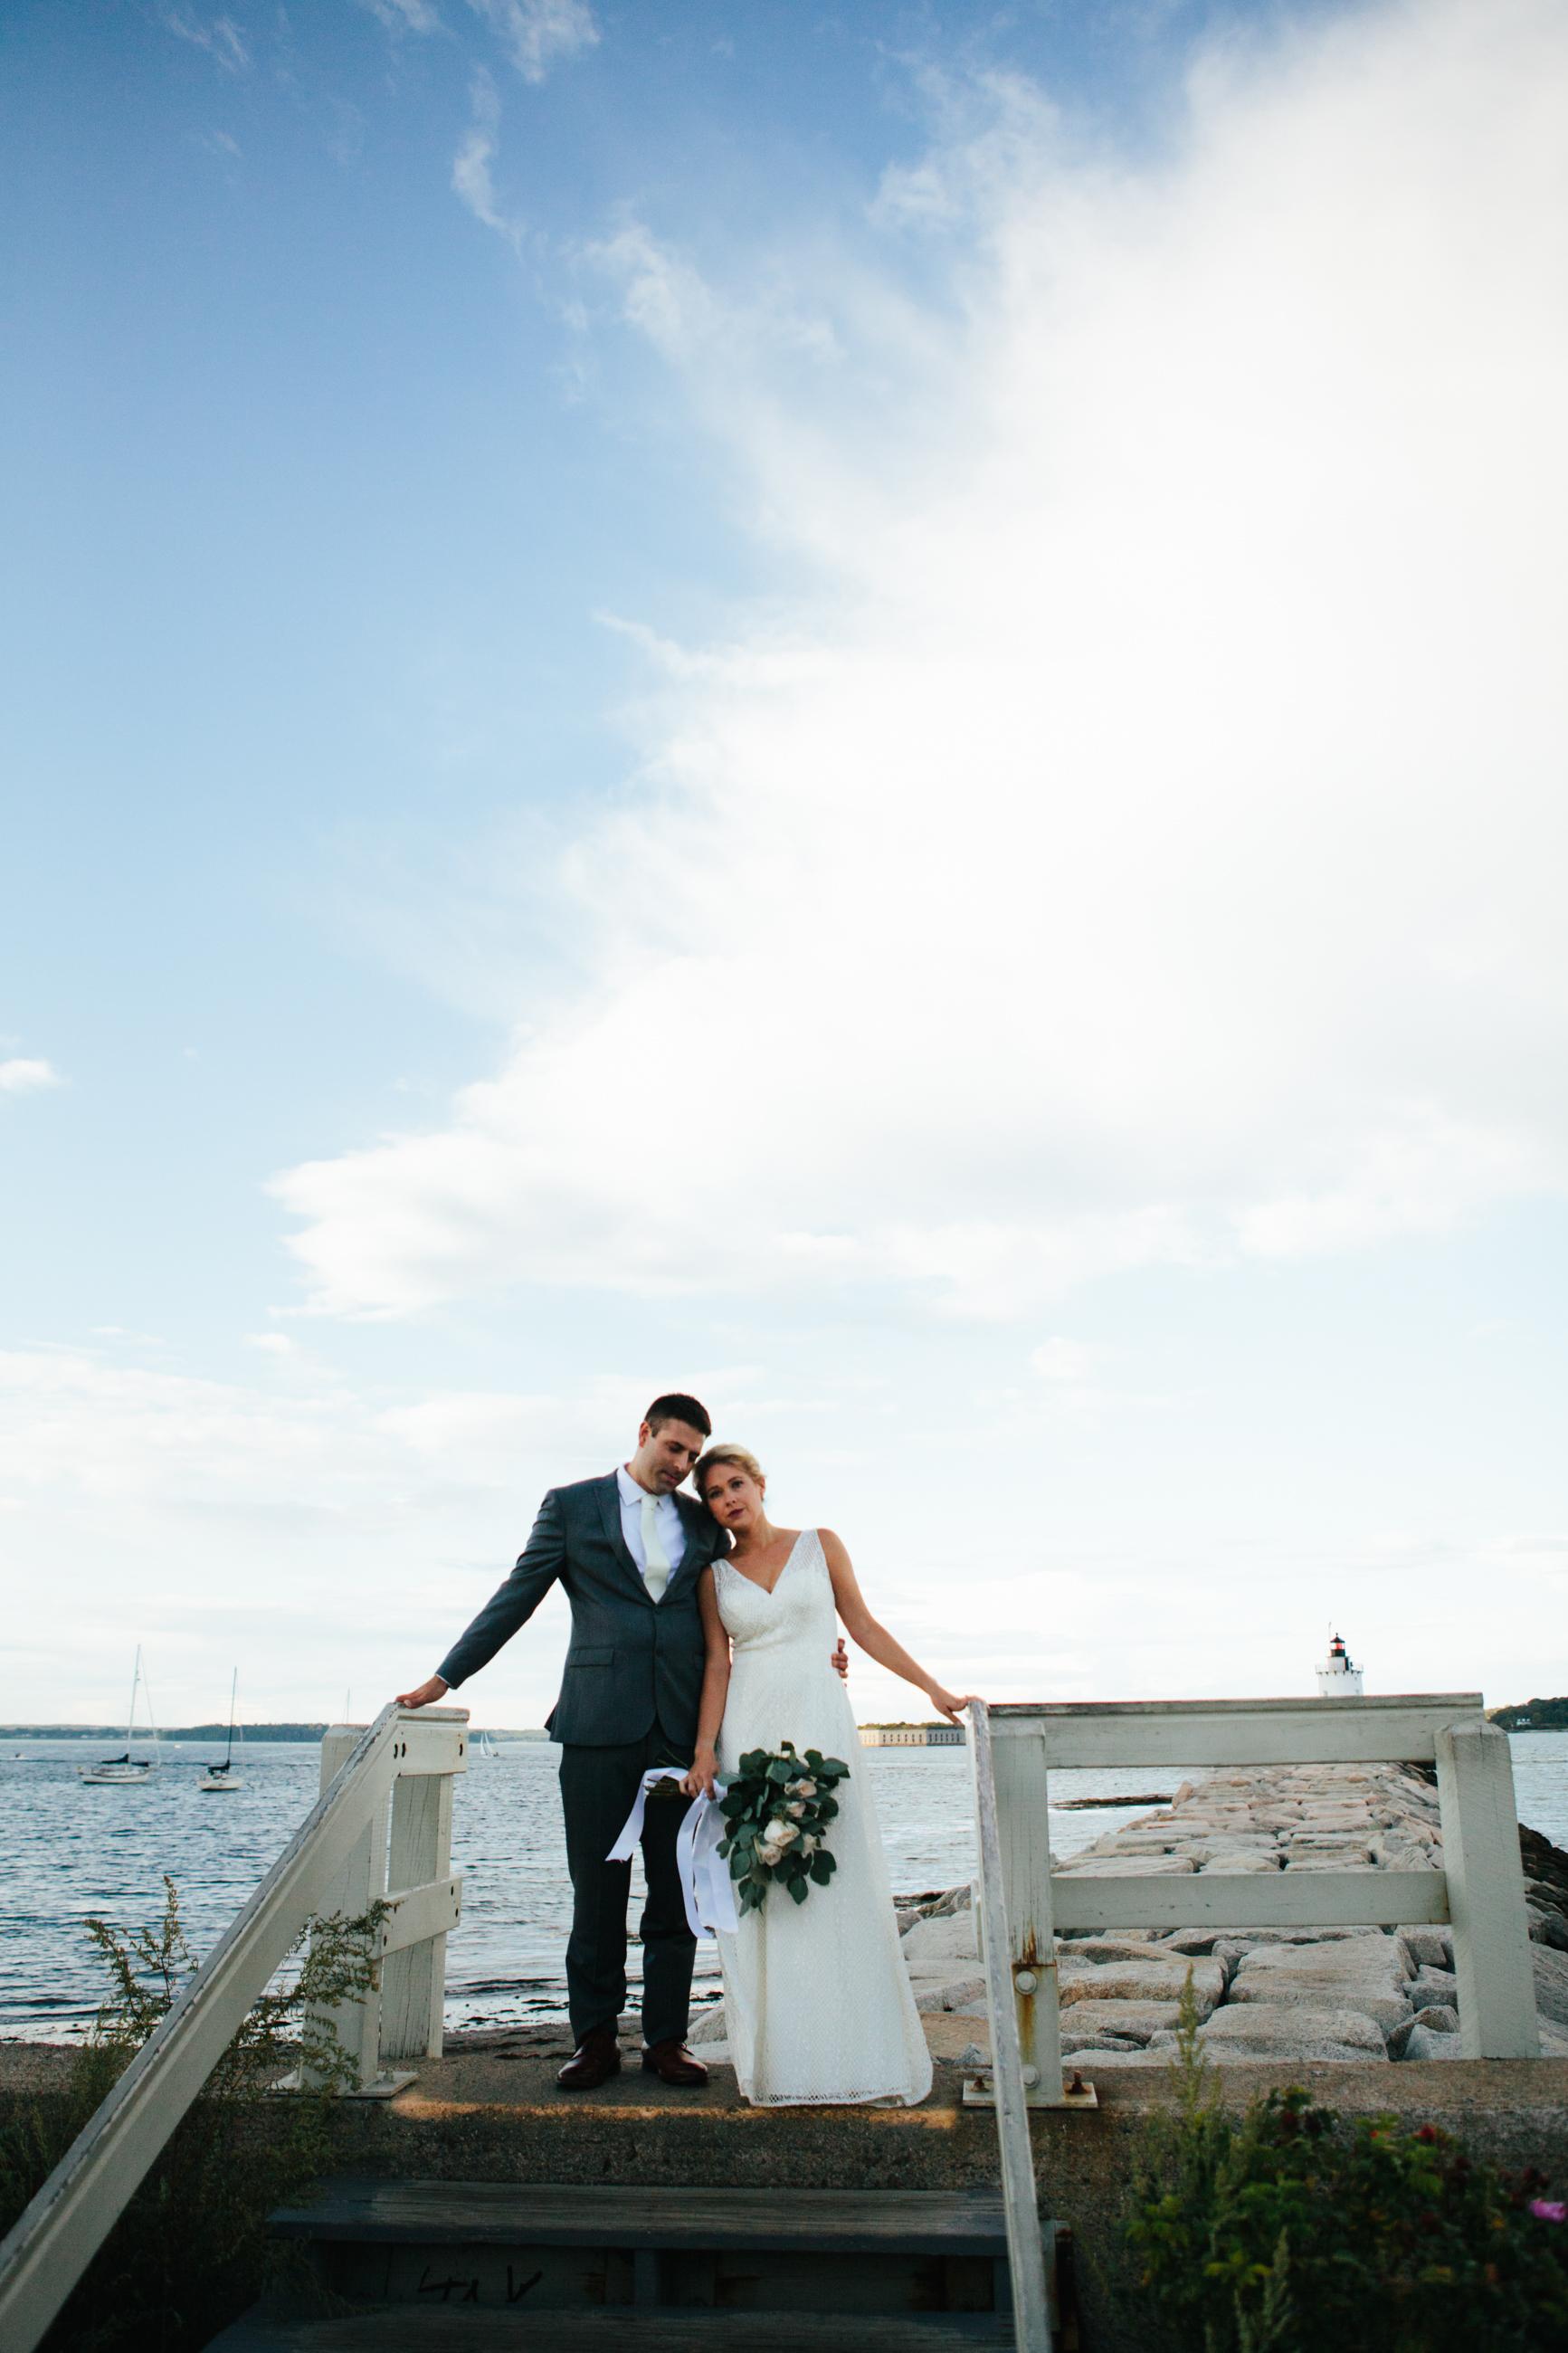 spring-point-ledge-lighthouse-wedding-south-portland-maine-2343.jpg